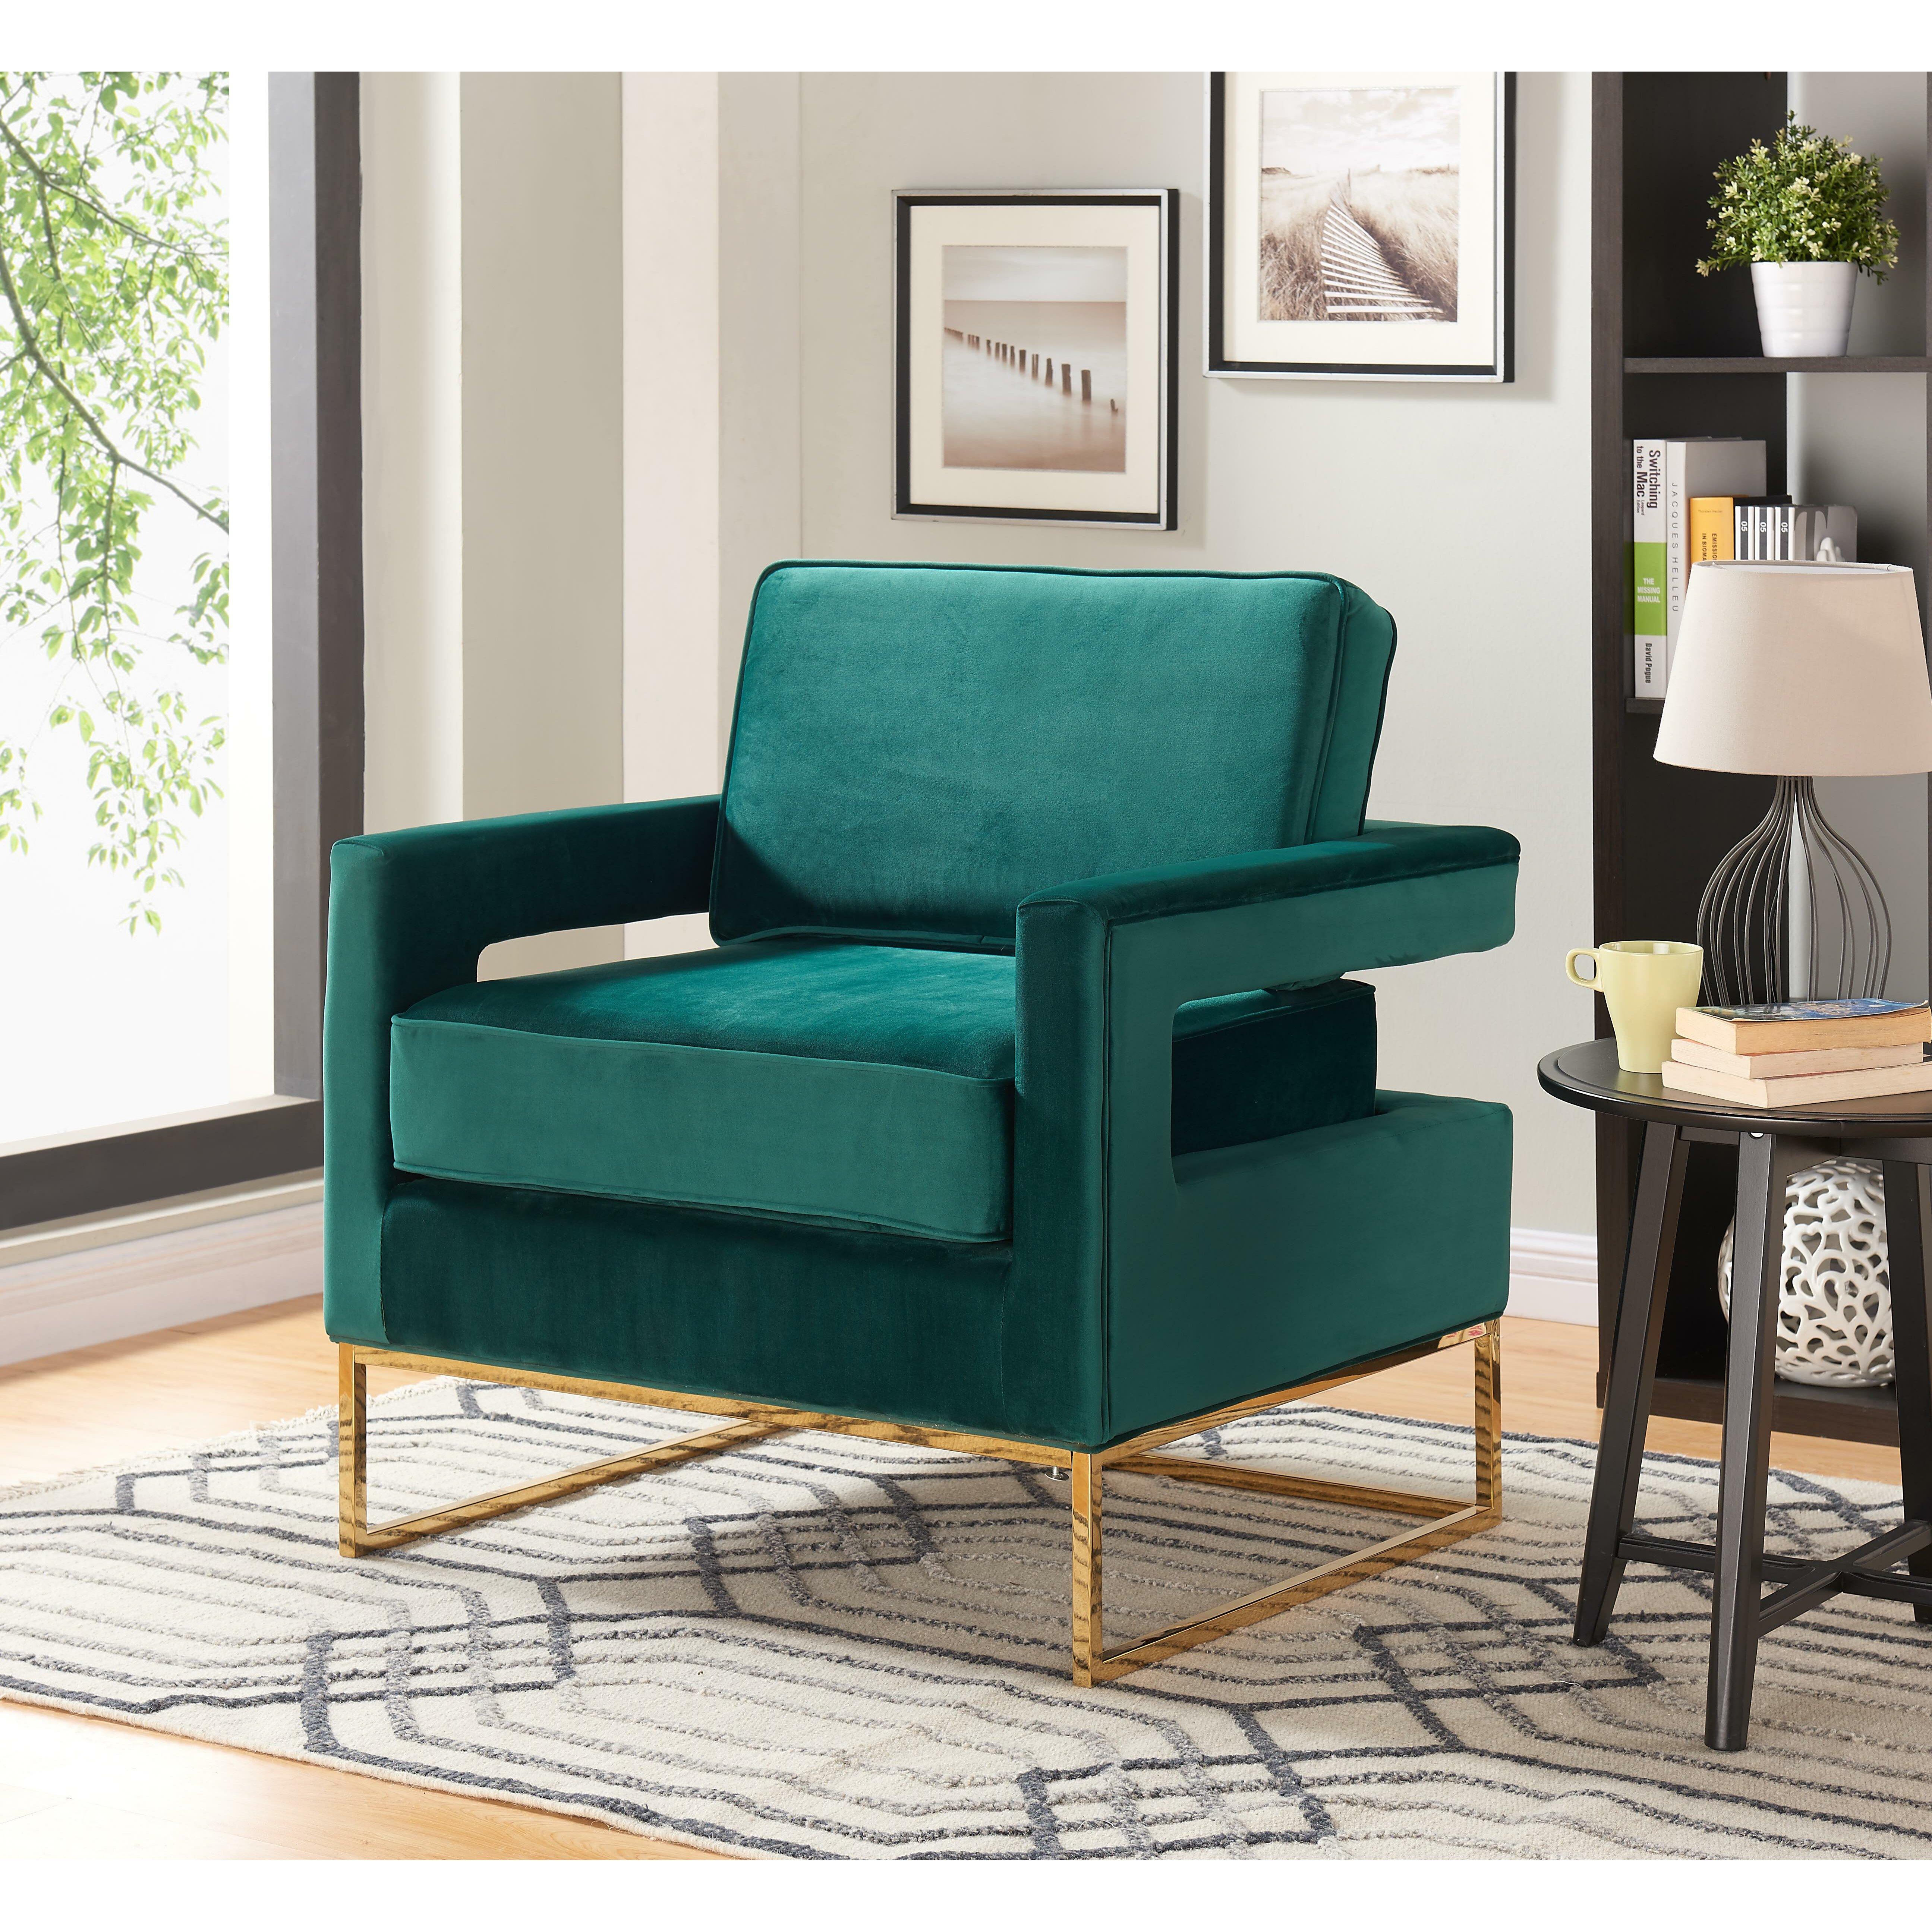 Meridian Furniture 28 Images Meridian Furniture Usa Velvet Sofa Reviews Wayfair Meridian